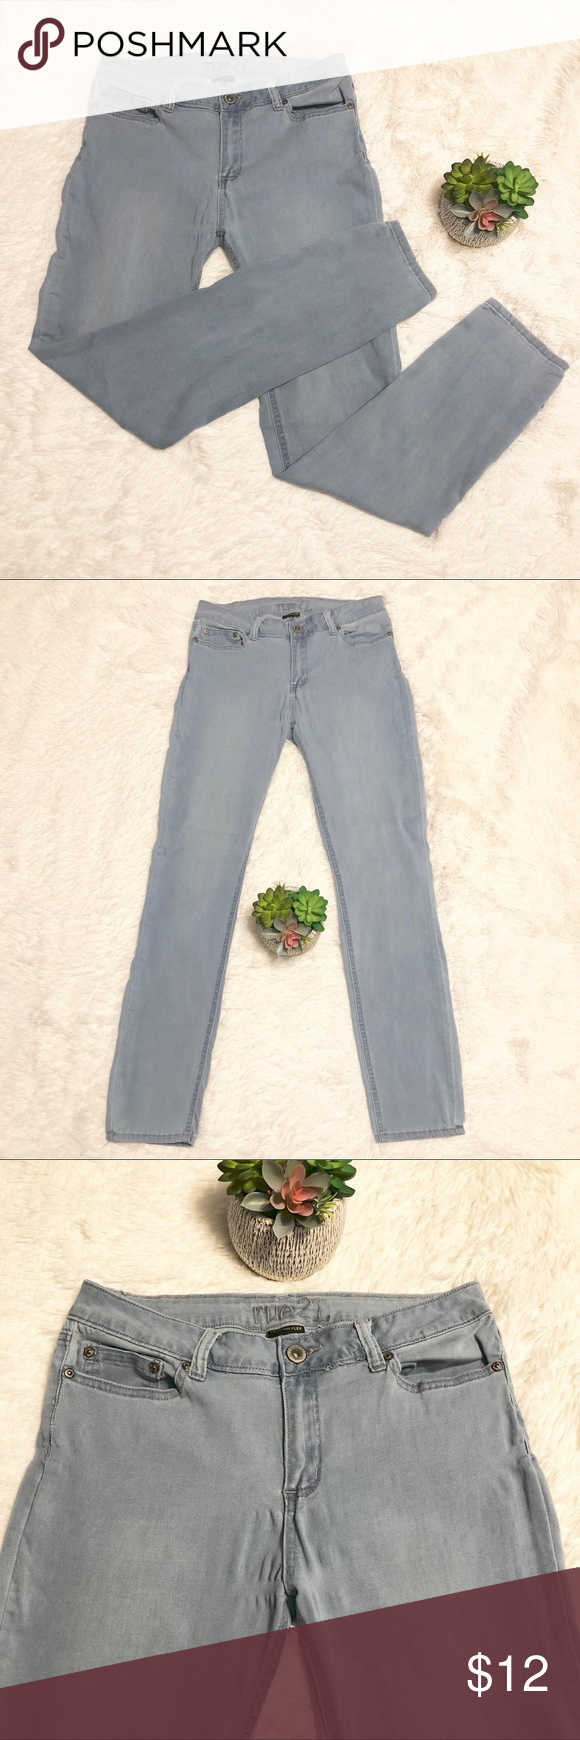 Rue21 Freedom Flex Mid Rise Skinny Jeans Rue21 Freedom Flex Mid Rise Skinny Jeans Cotton Polyester Rayon Spandex Mid Rise Skinny Jeans Skinny Jeans Skinny